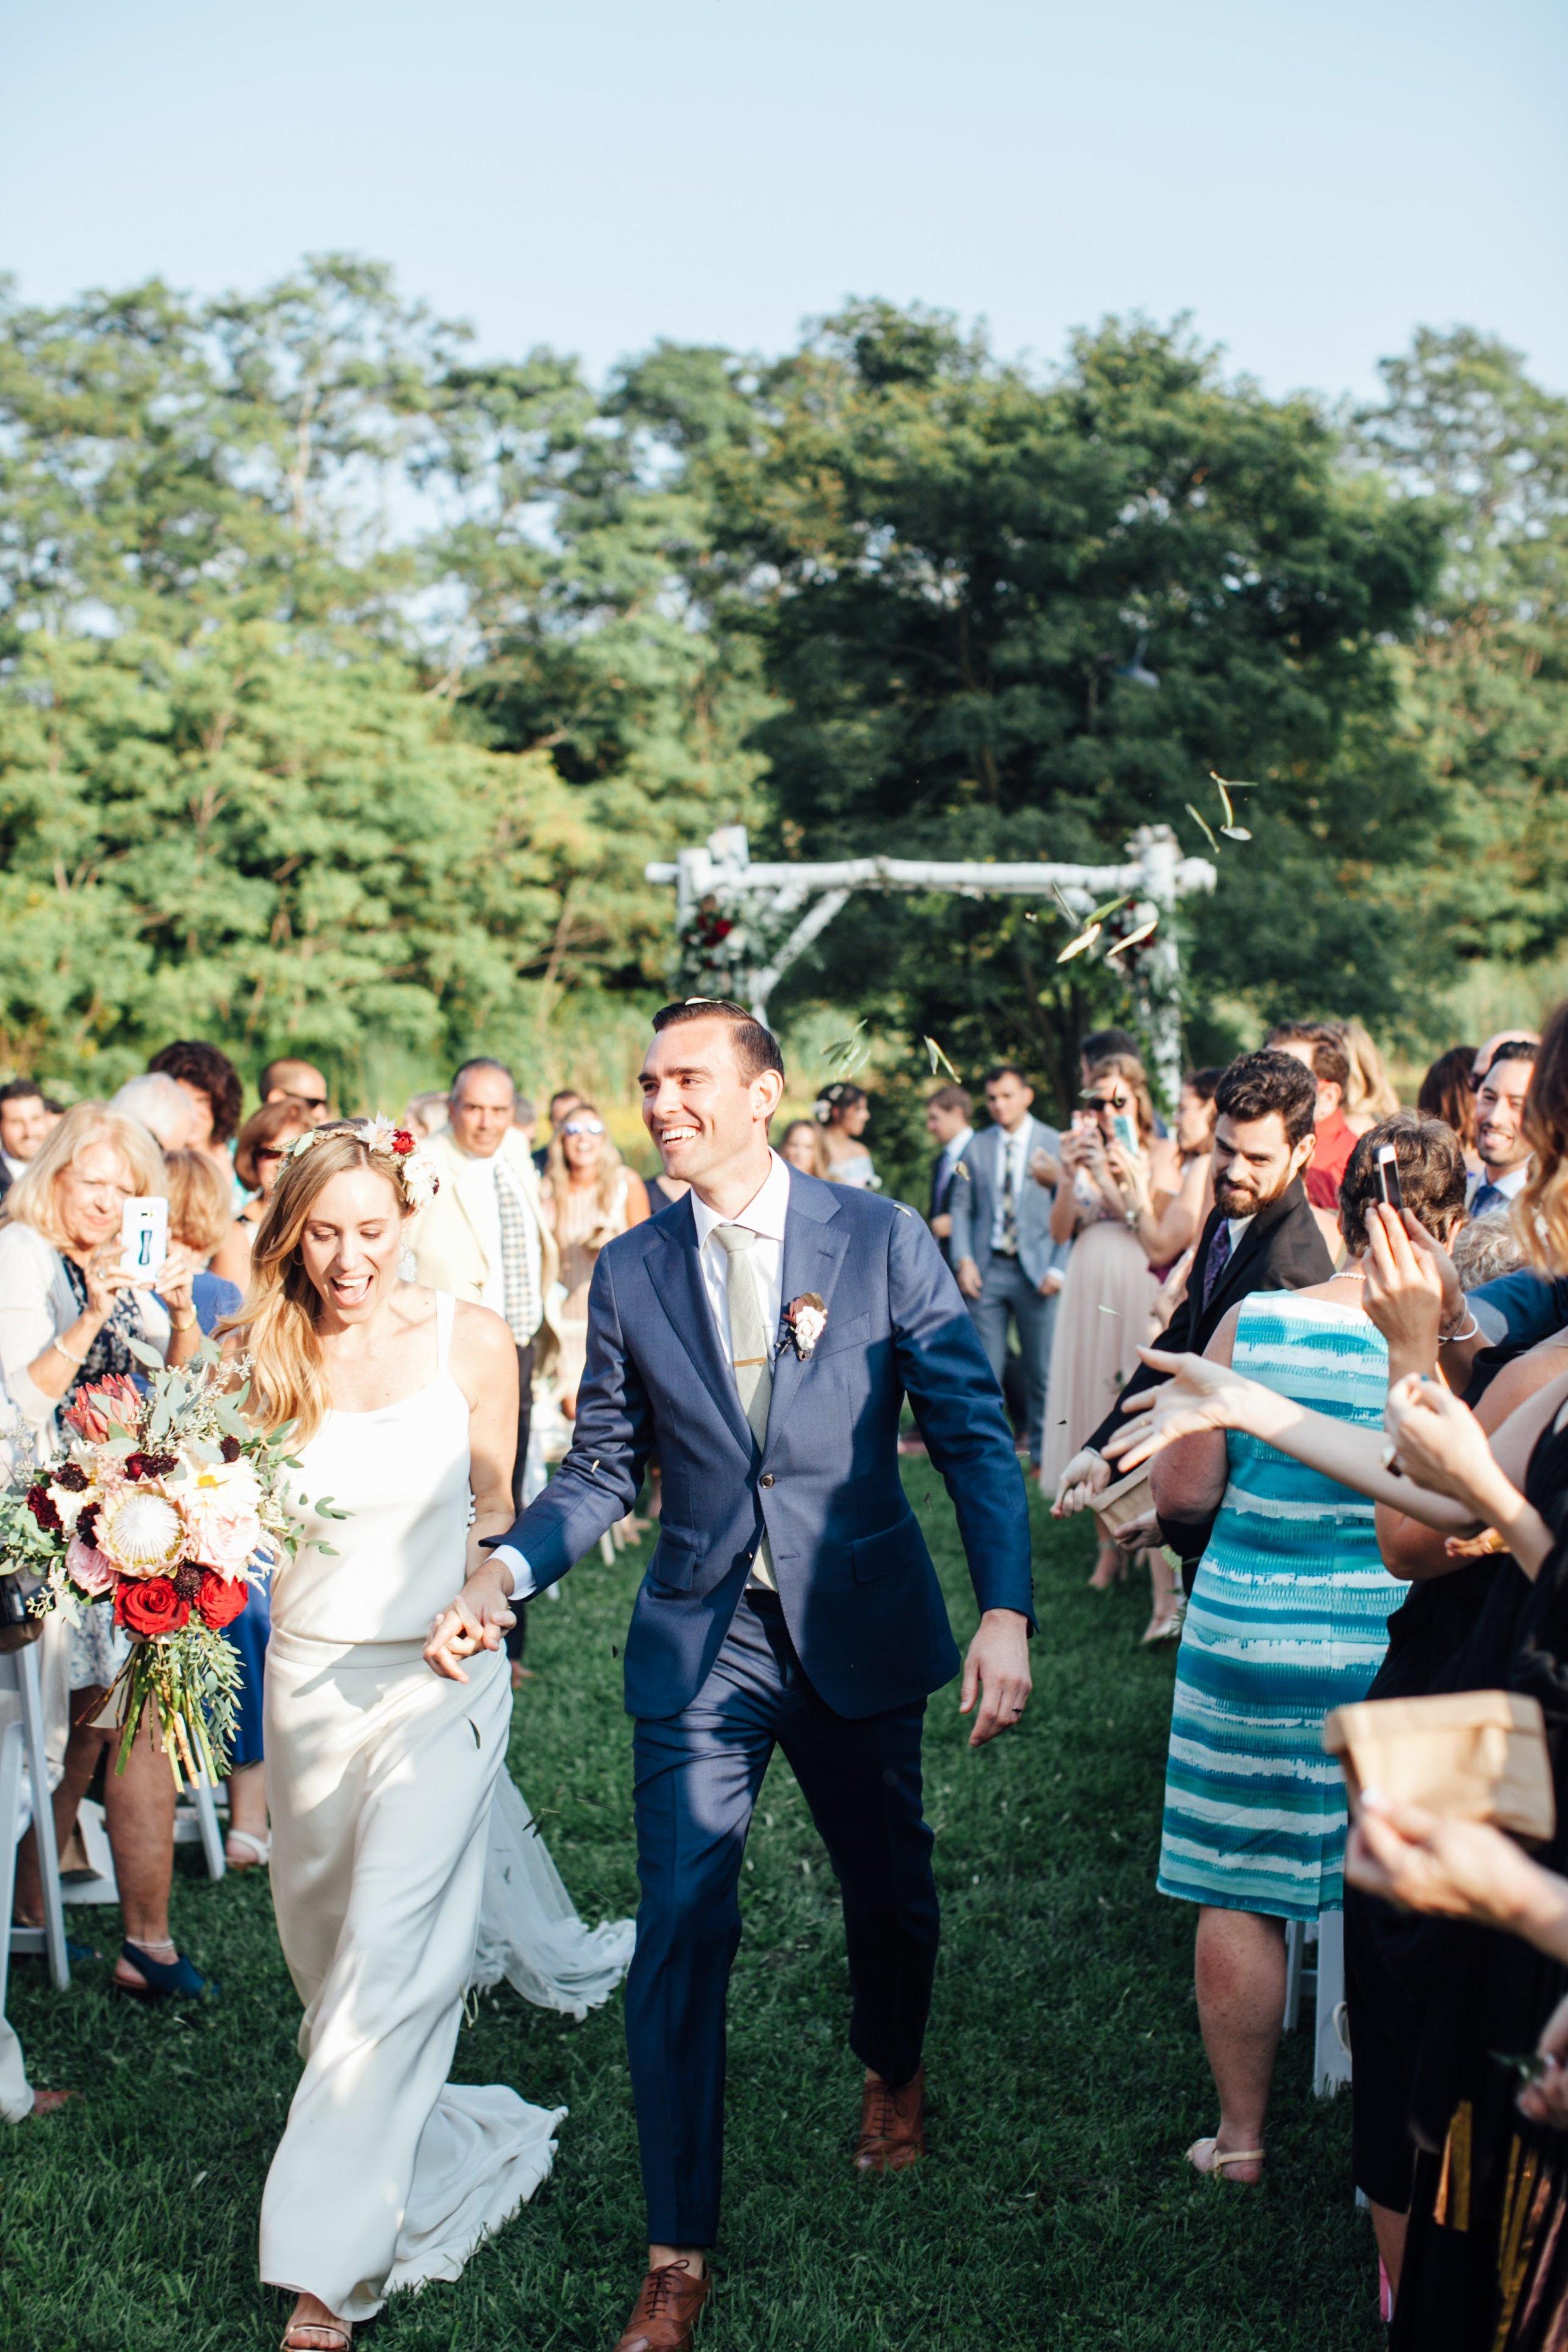 Courtney + Matt Blenheim Hill Farm Catskills NY Wedding Veronica Lola Photography 2017-433.jpg